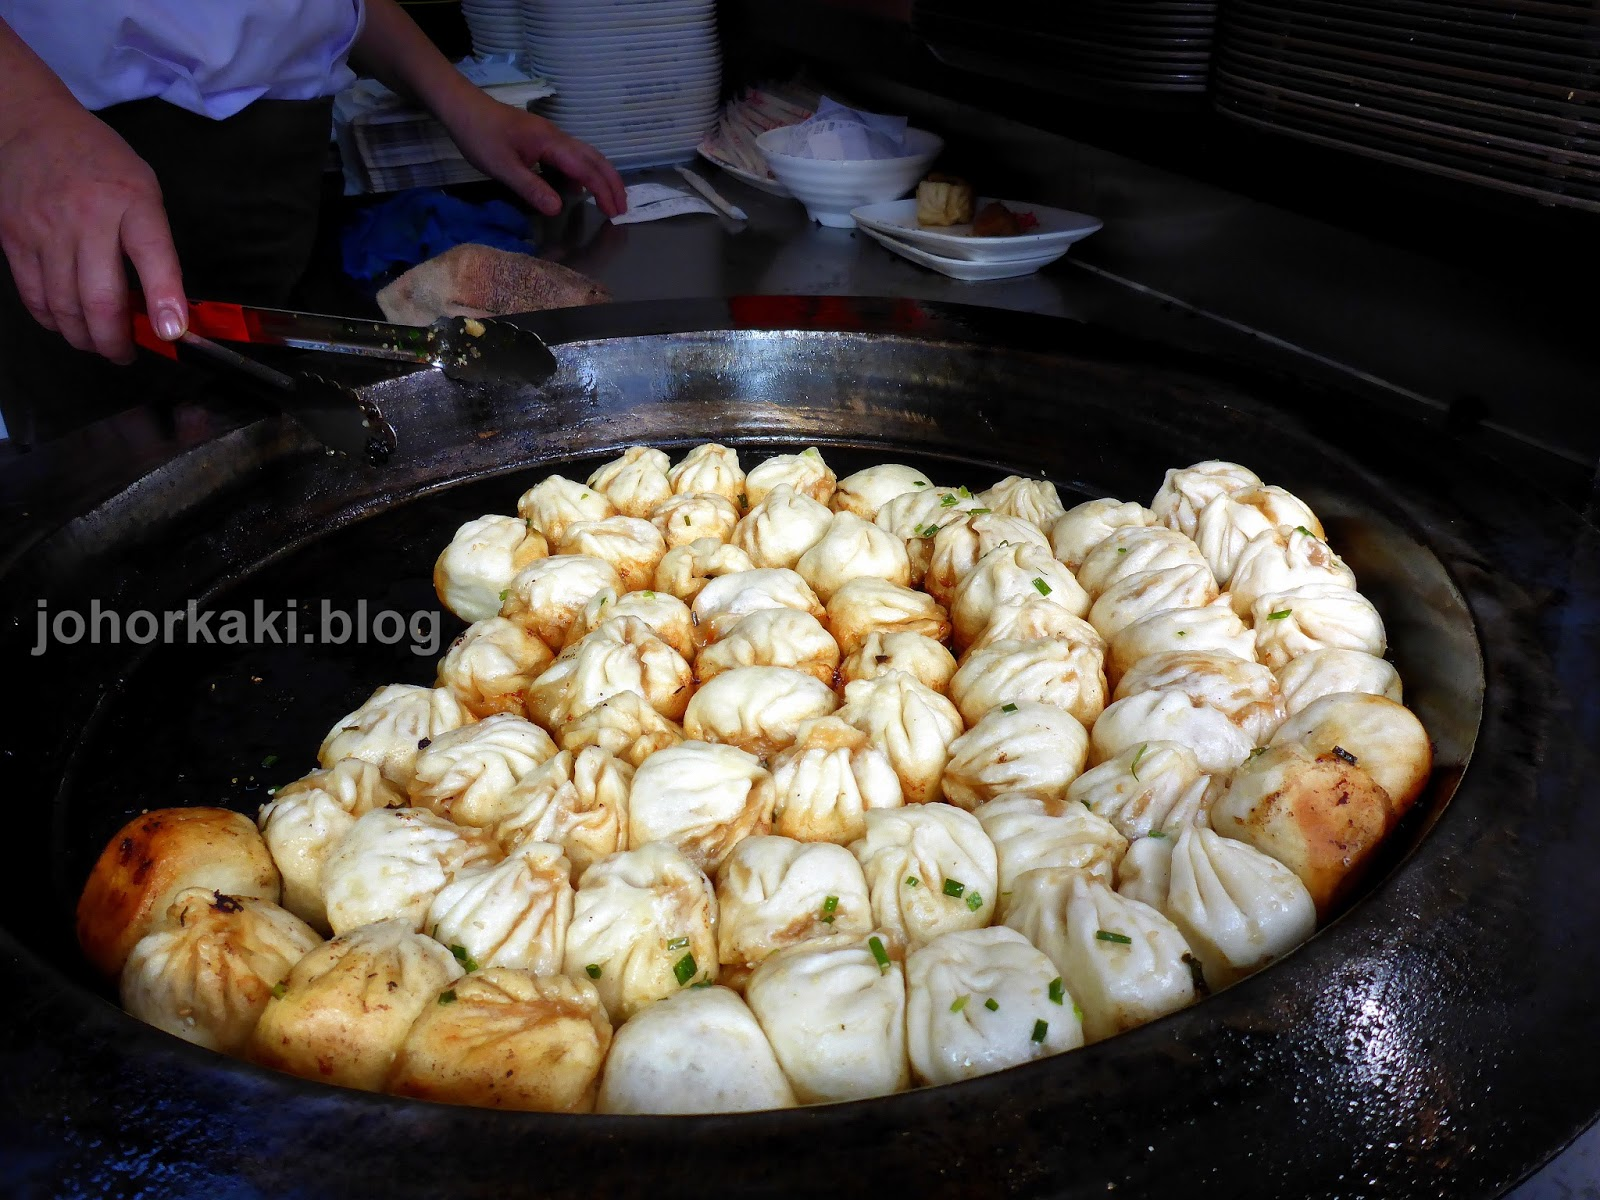 Best shanghai street food pan fried dumplings jk1540 for Cuisine kaki